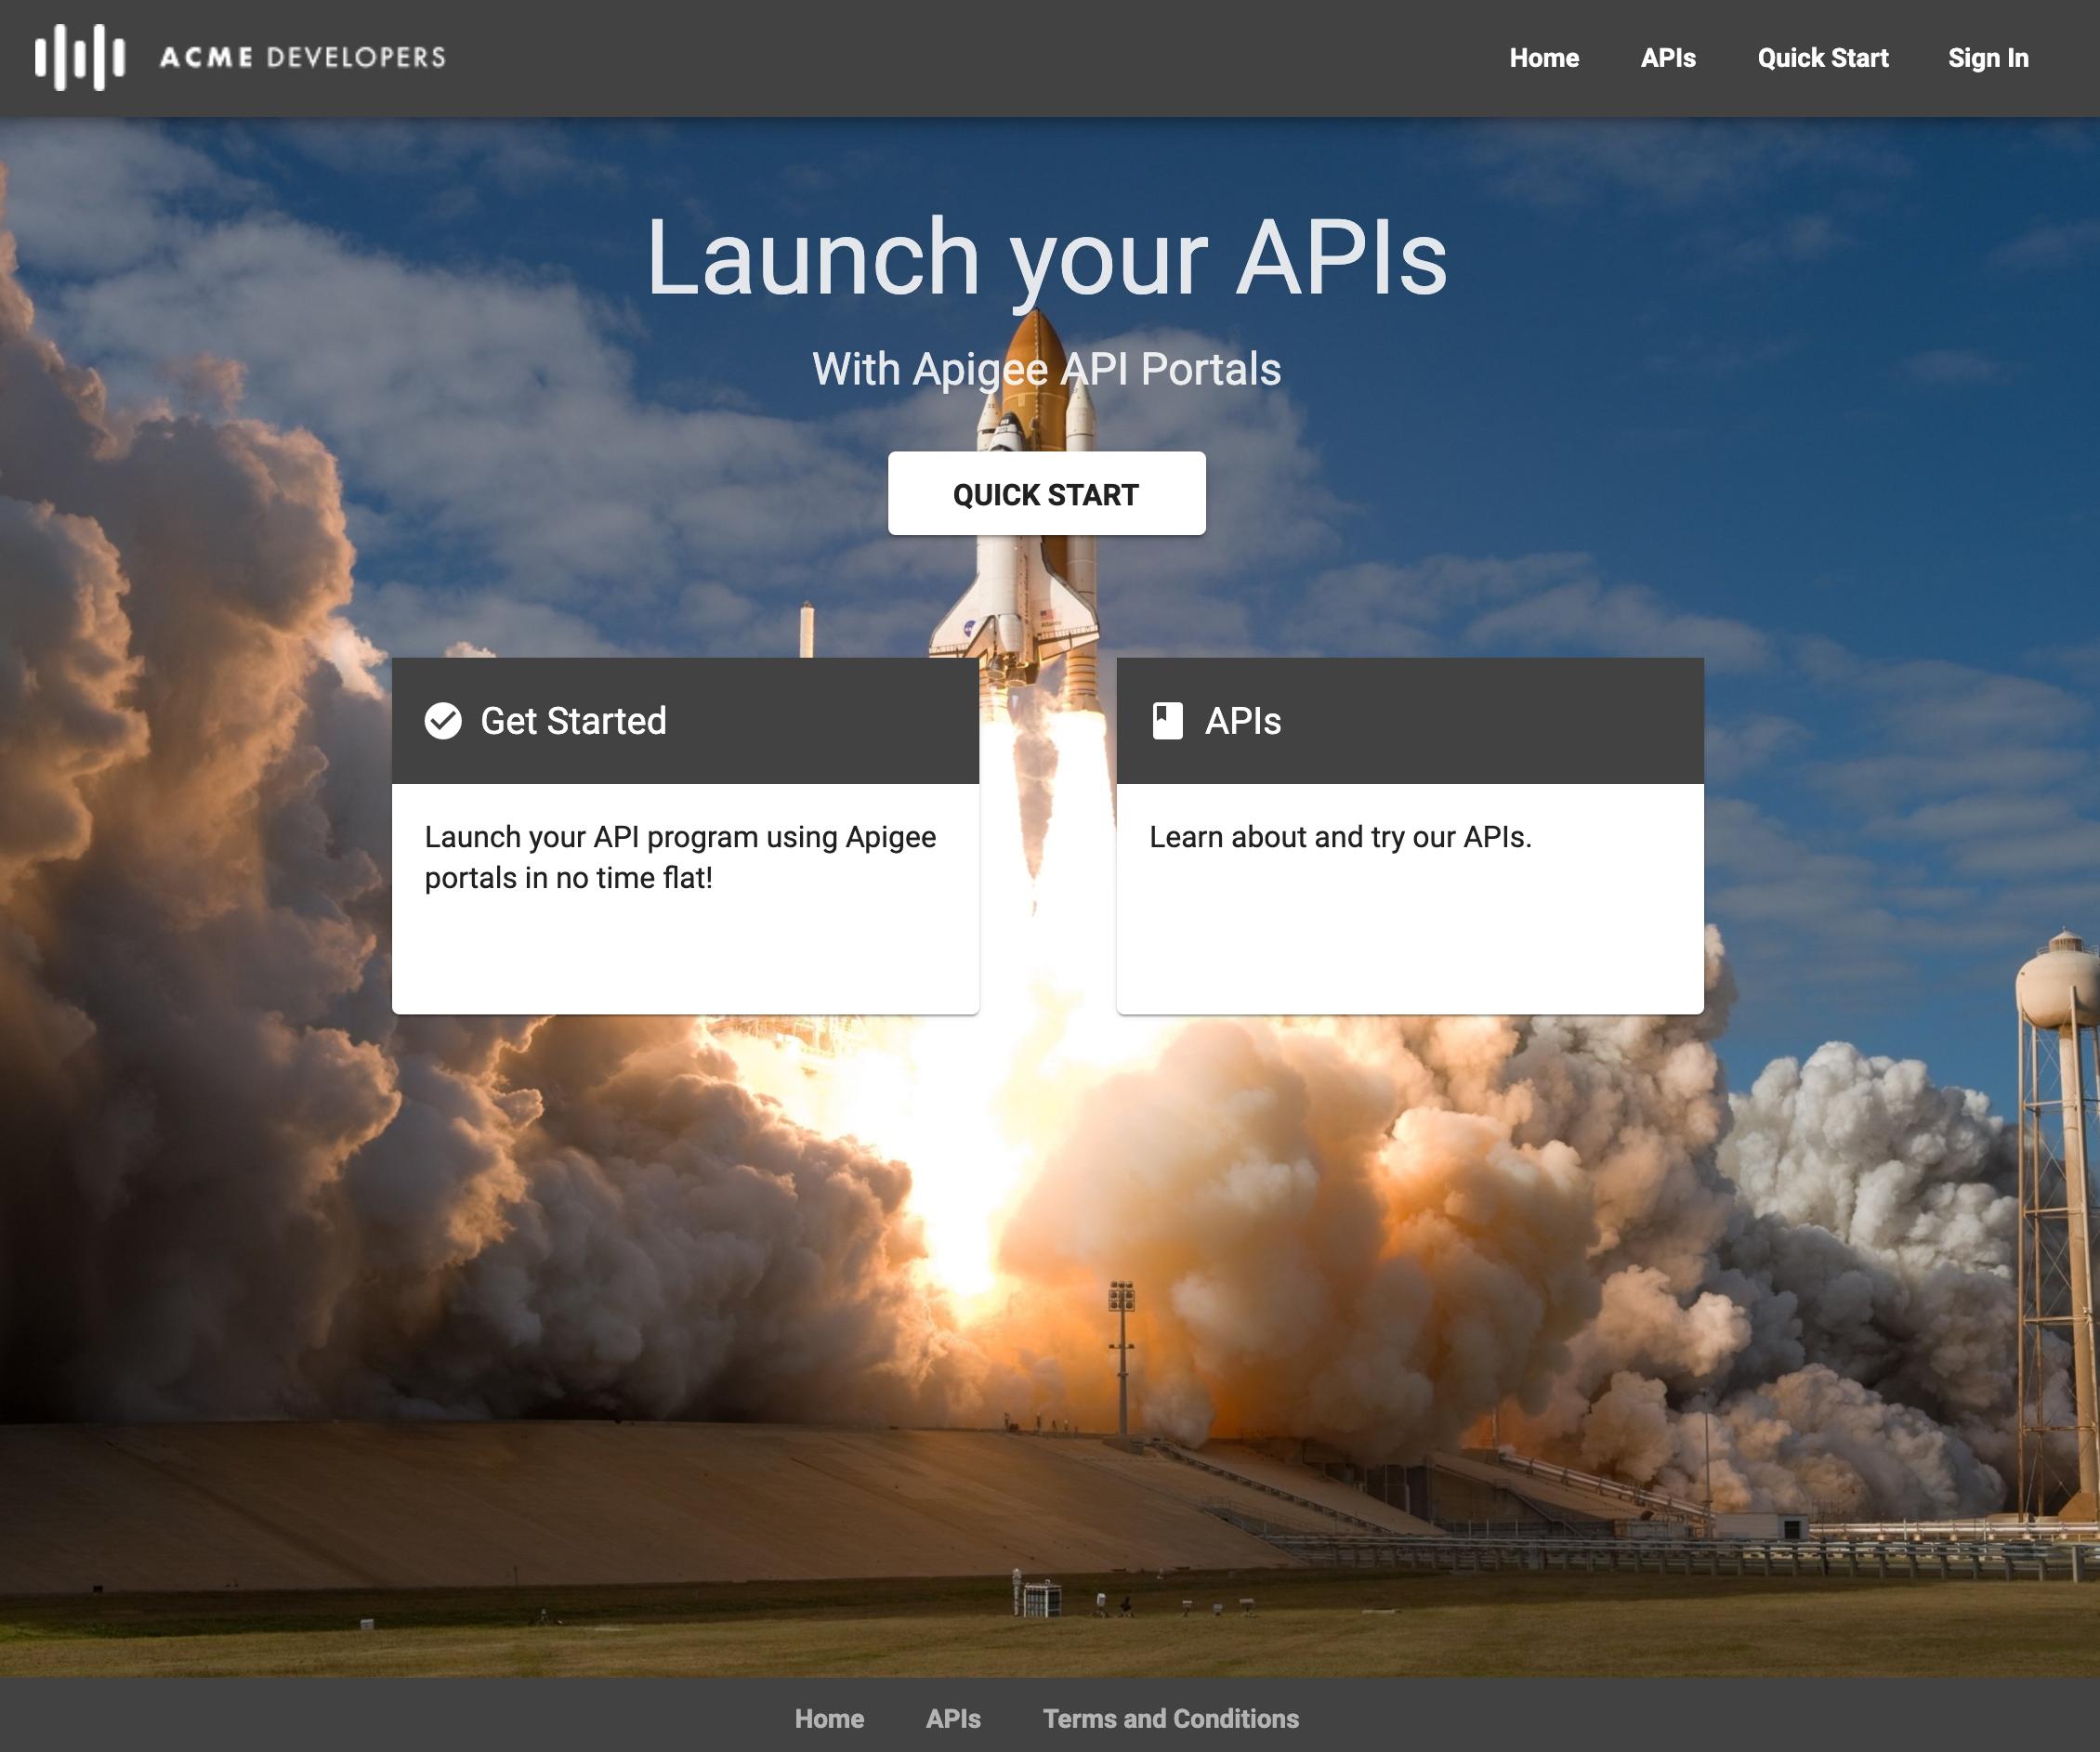 「Quick Start」、「Get Started」、「APIs」というラベルが付いたリンクがあるデフォルトの統合ポータルページ。